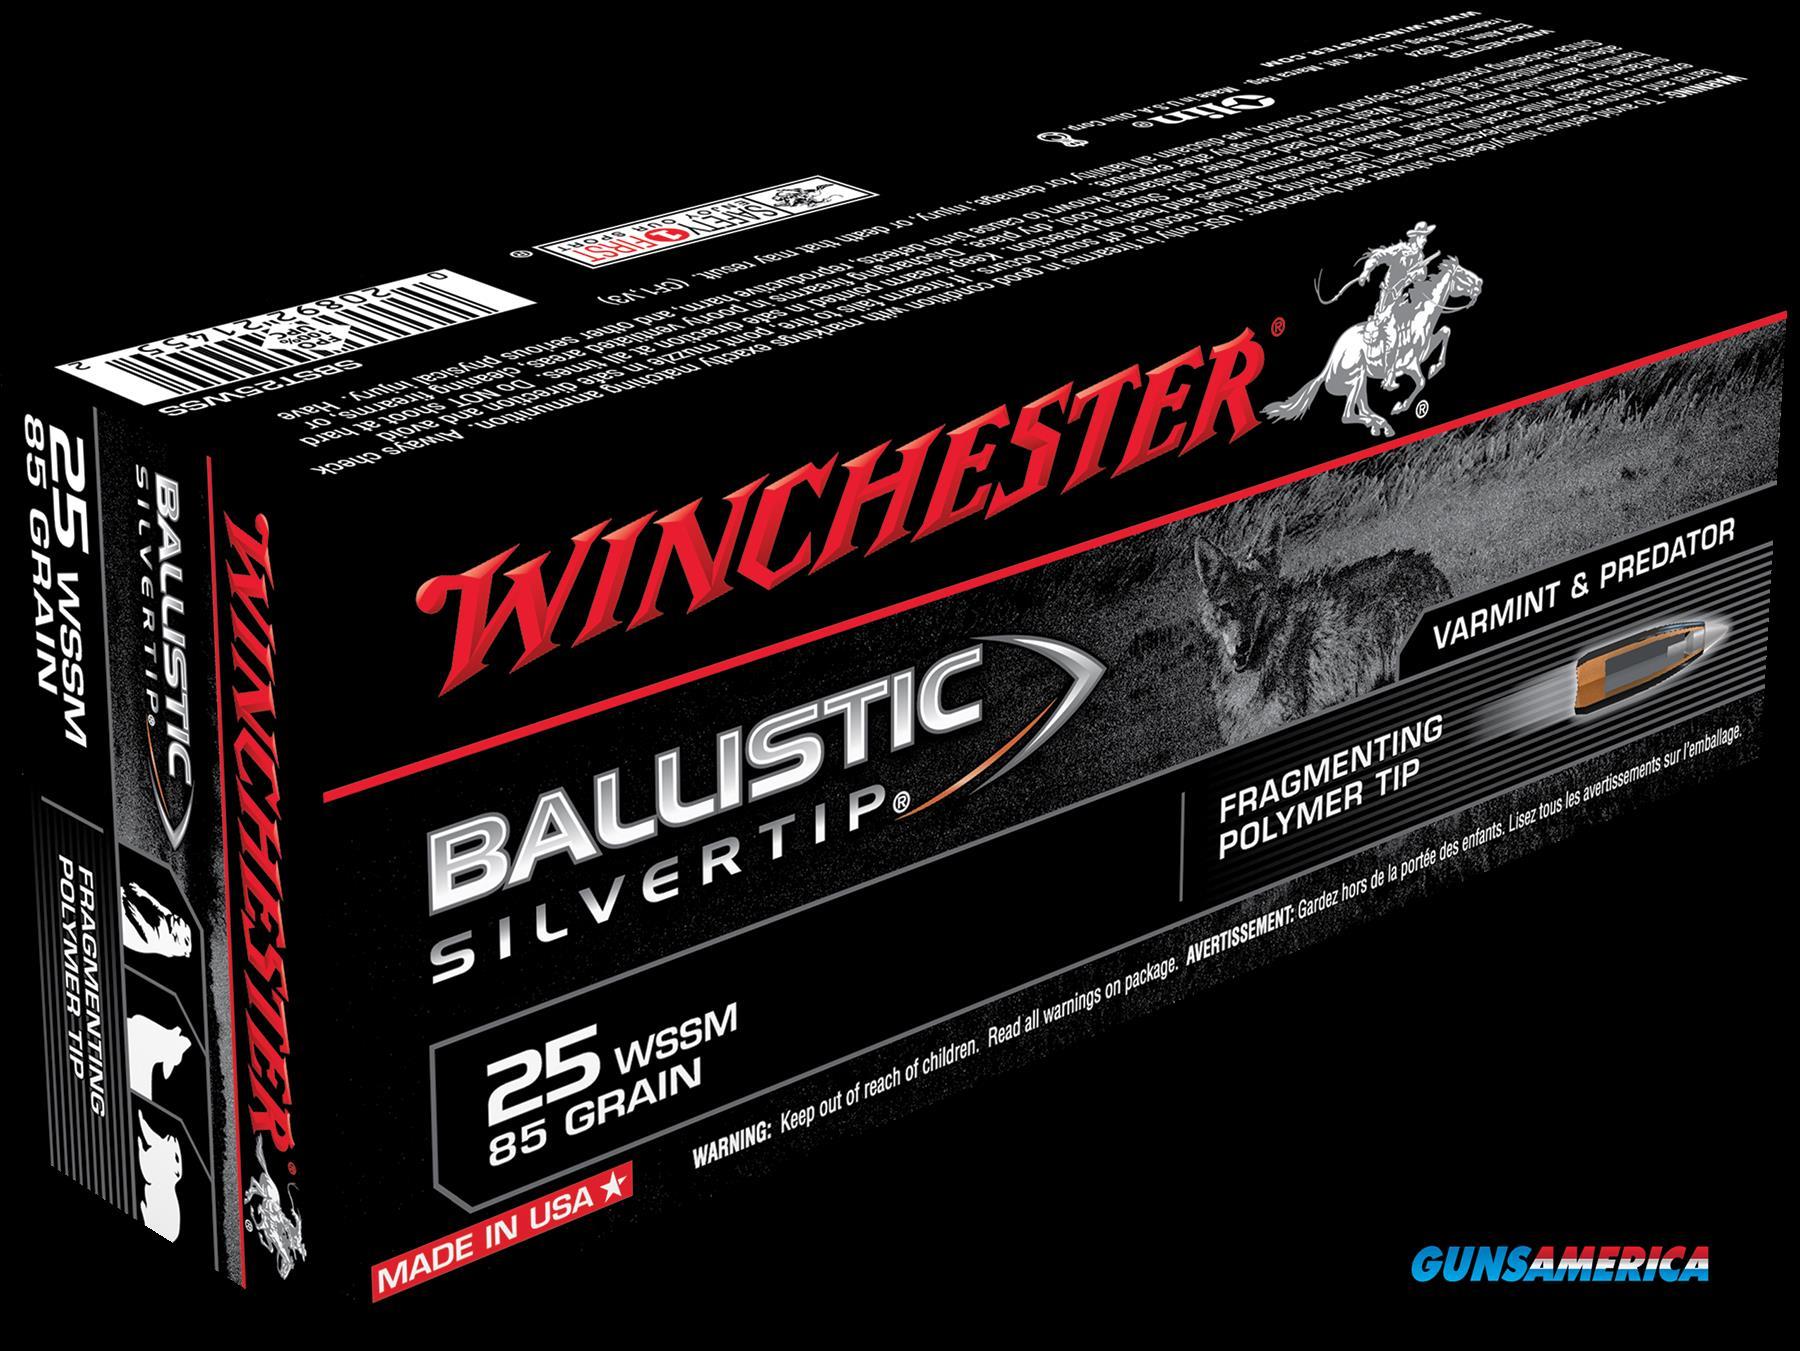 Winchester Ammo Supreme, Win Sbst25wss     25wssm  85blst 20-10  Guns > Pistols > 1911 Pistol Copies (non-Colt)